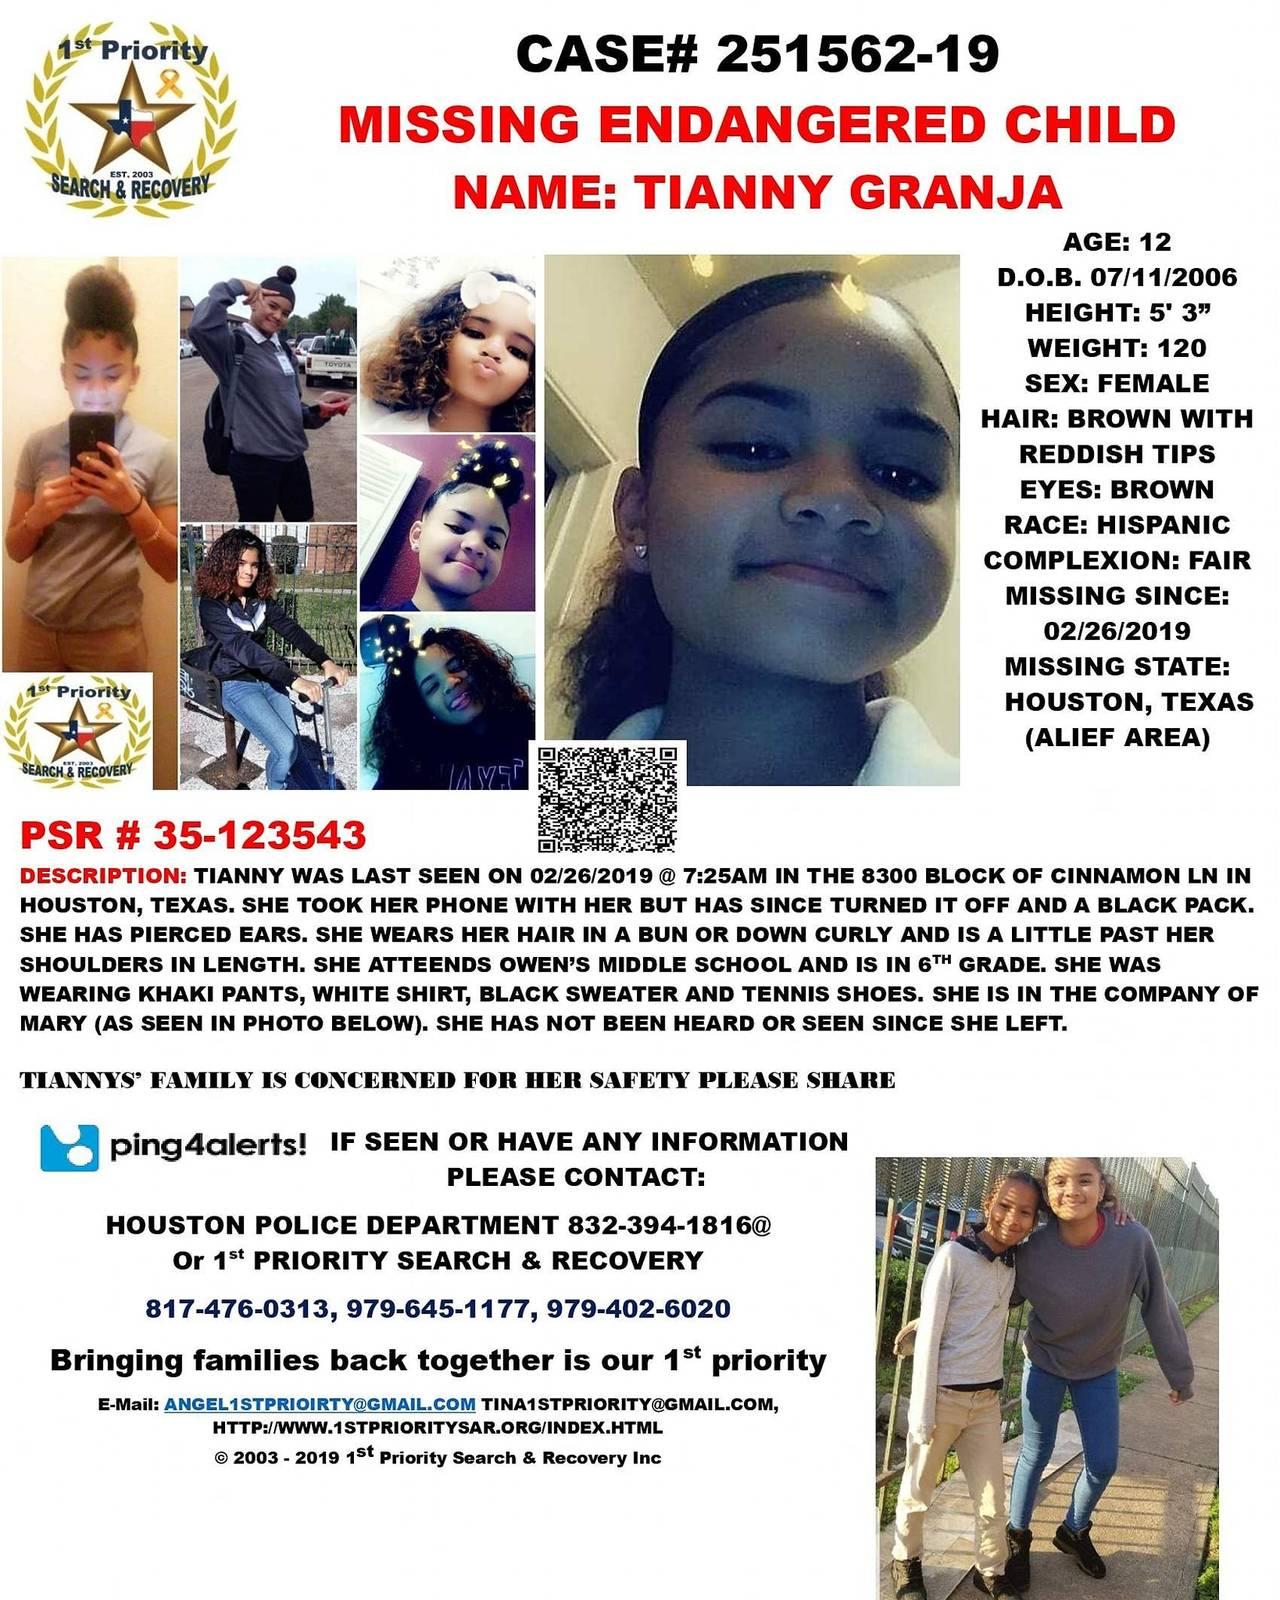 Tianny Granja missing poster_1551390680692.jpg.jpg